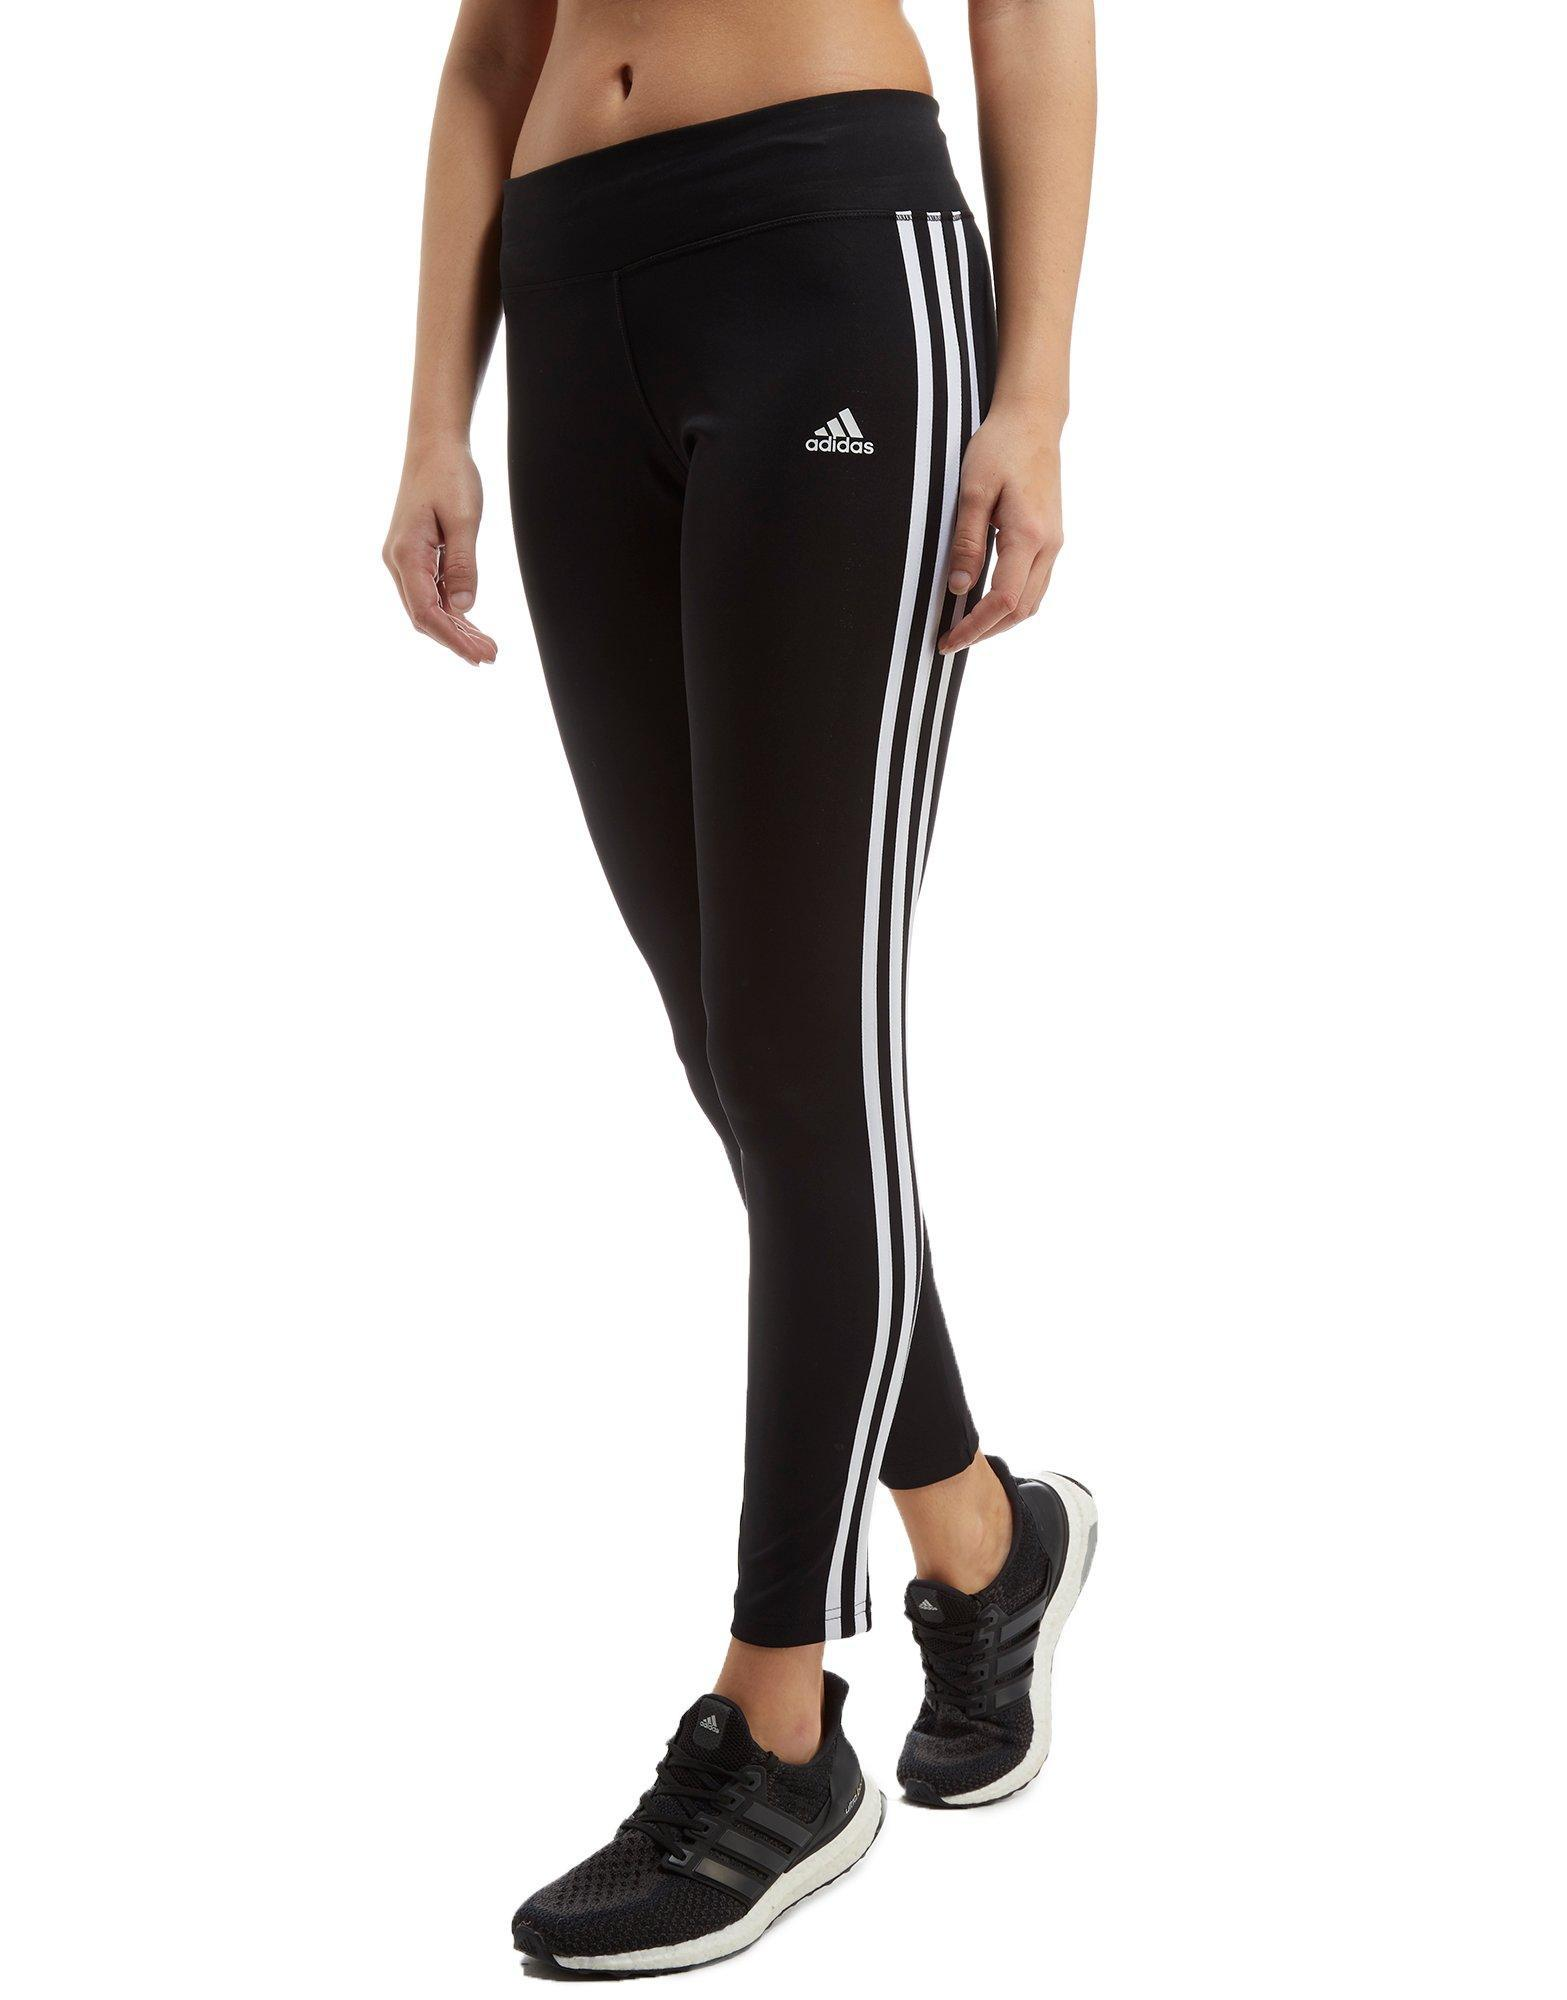 Lyst Adidas 19999 Basic Basic 3 rayas Black Long Tights in Black 09339a2 - generiskmedicin.website